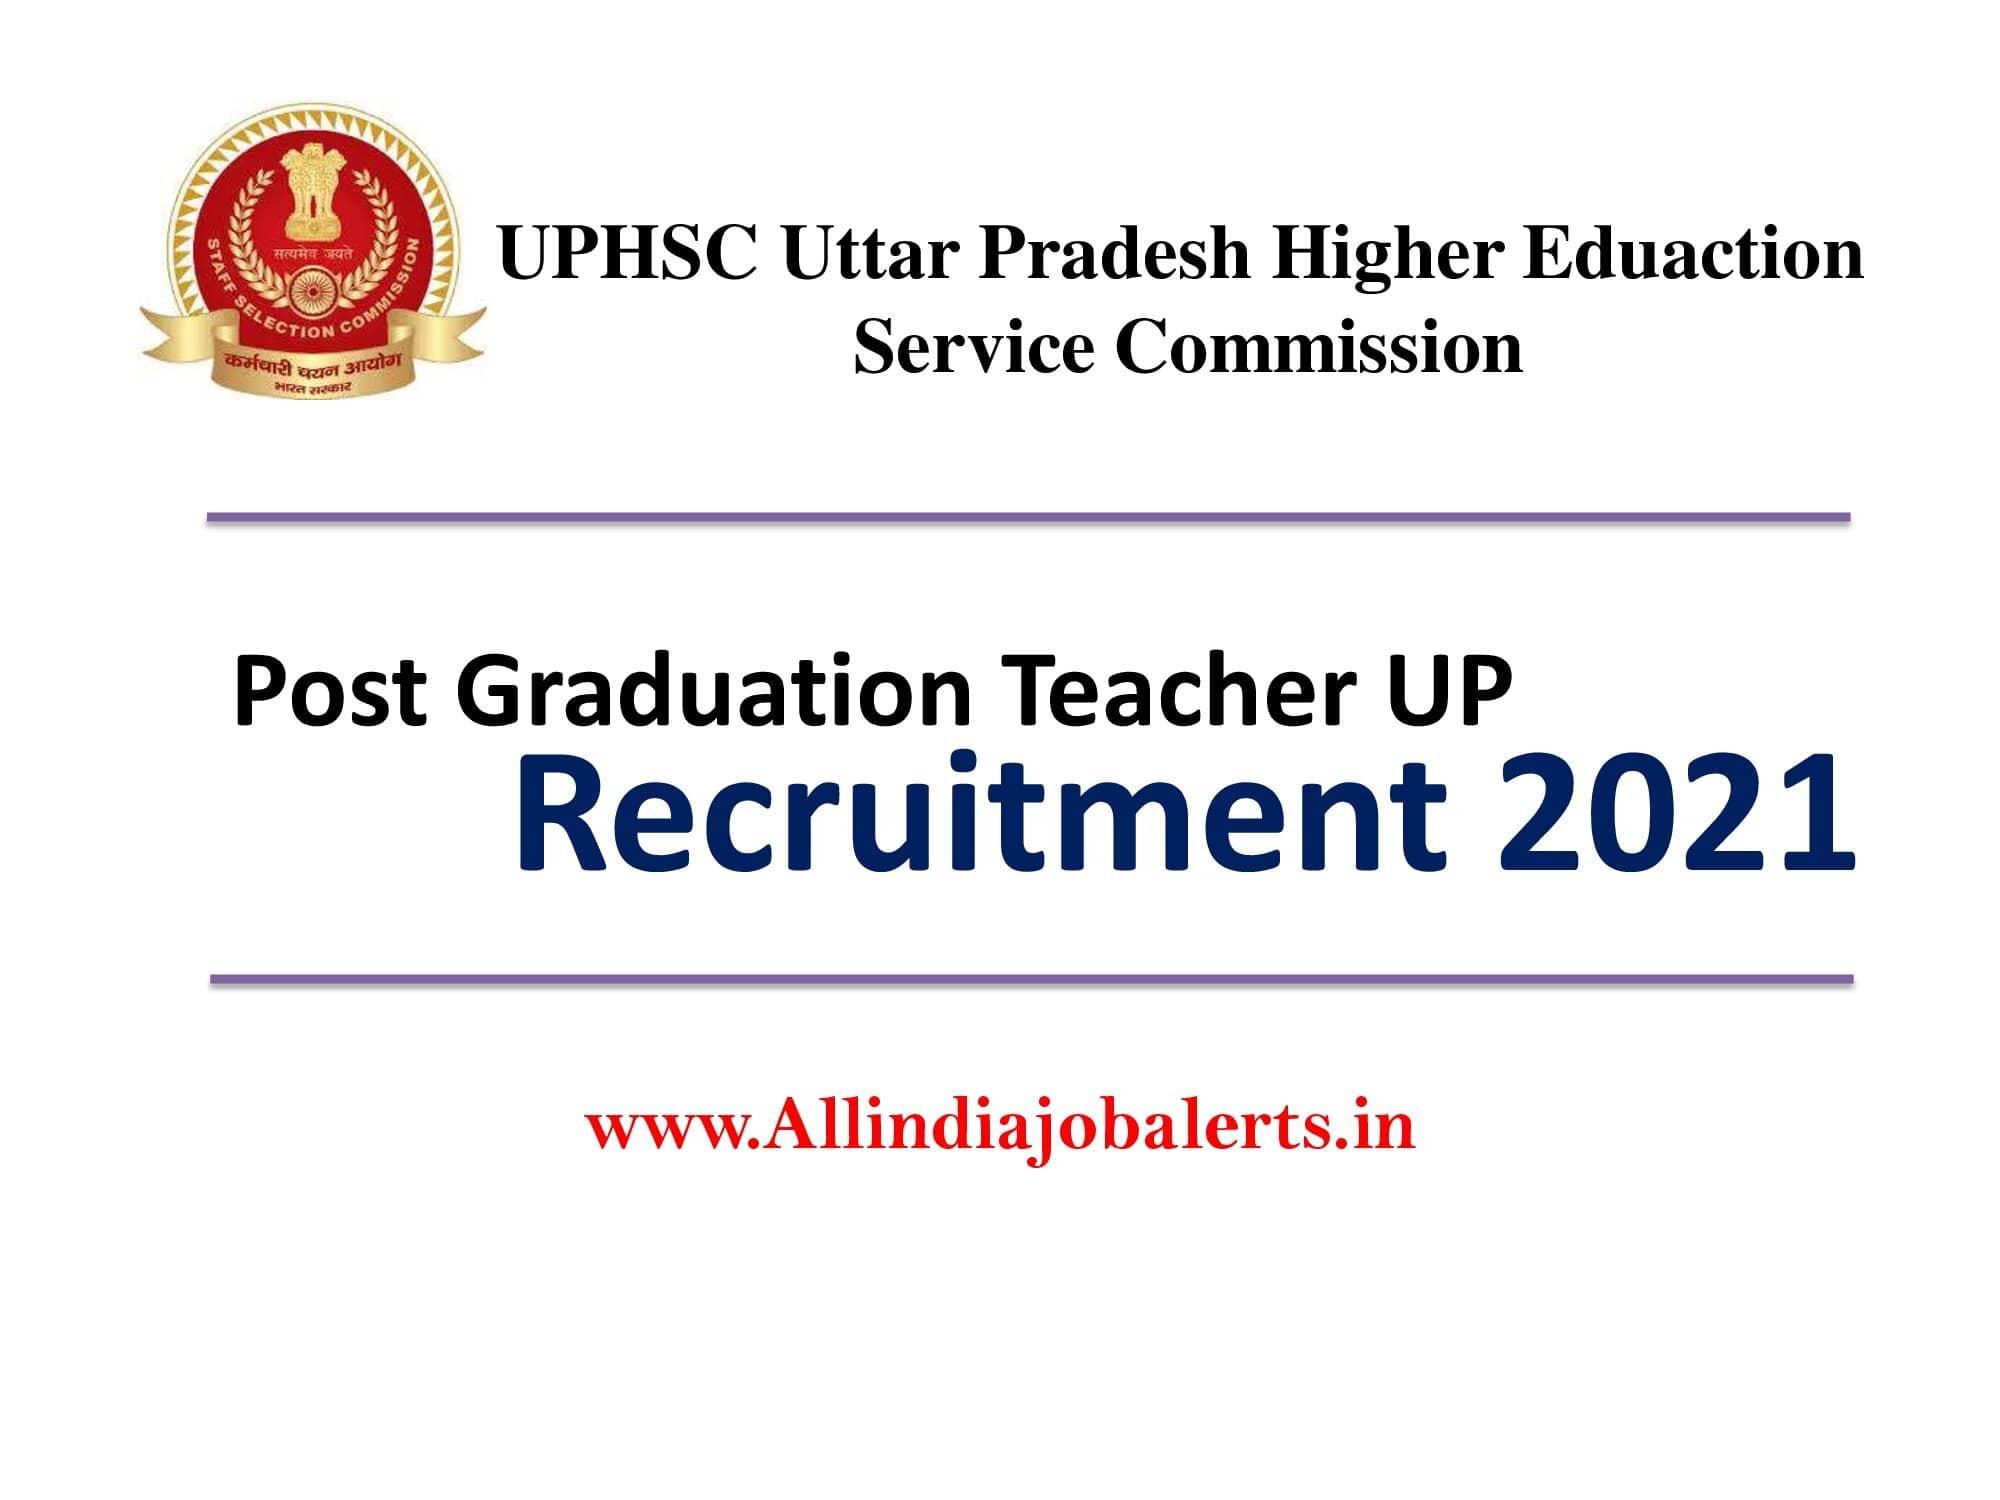 UPHESC Assistant Professor Recruitment 2021